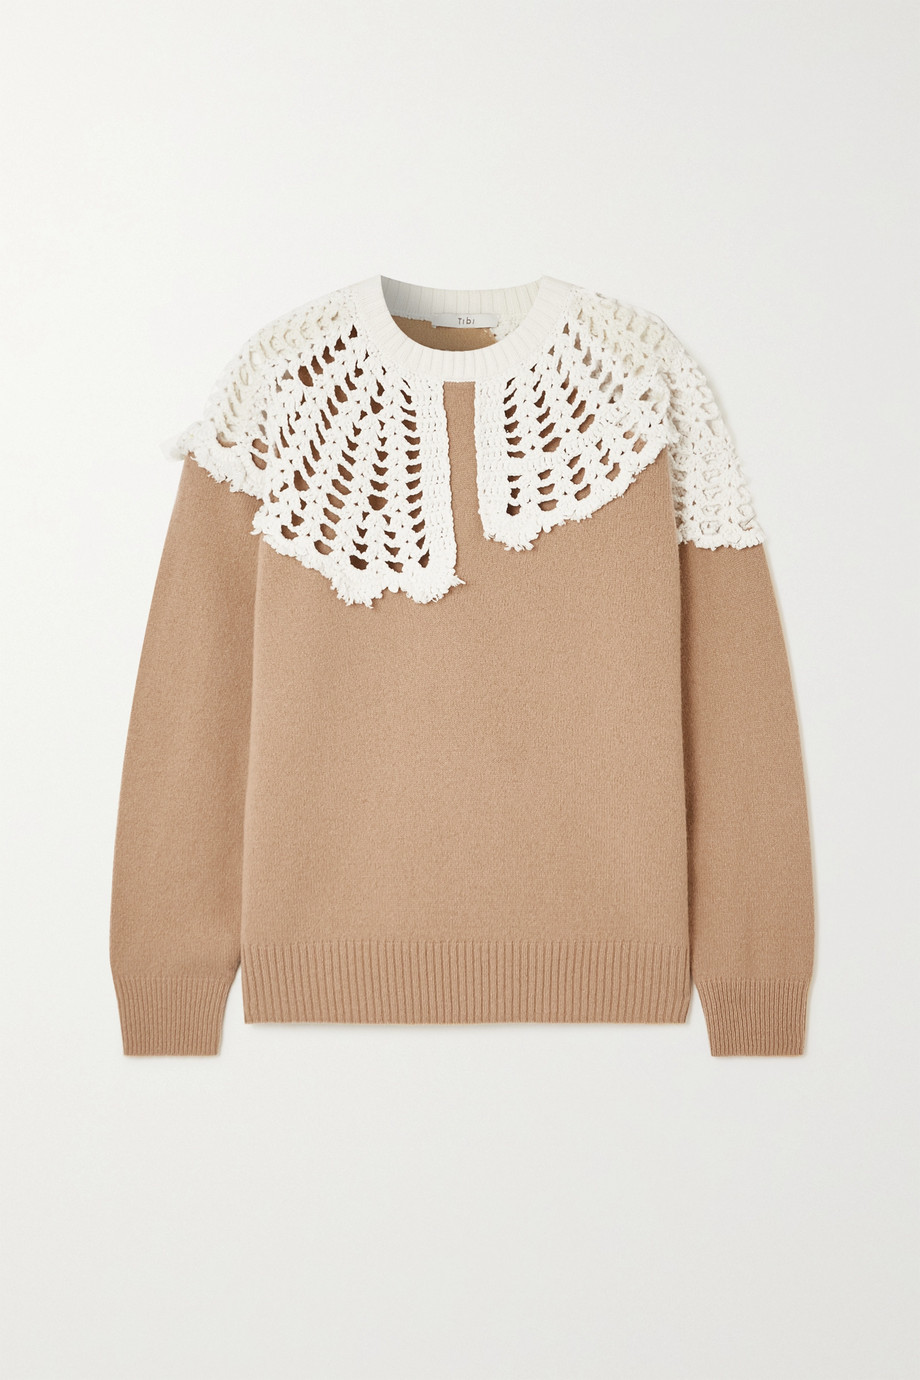 Tibi Lana crocheted cotton and wool sweater